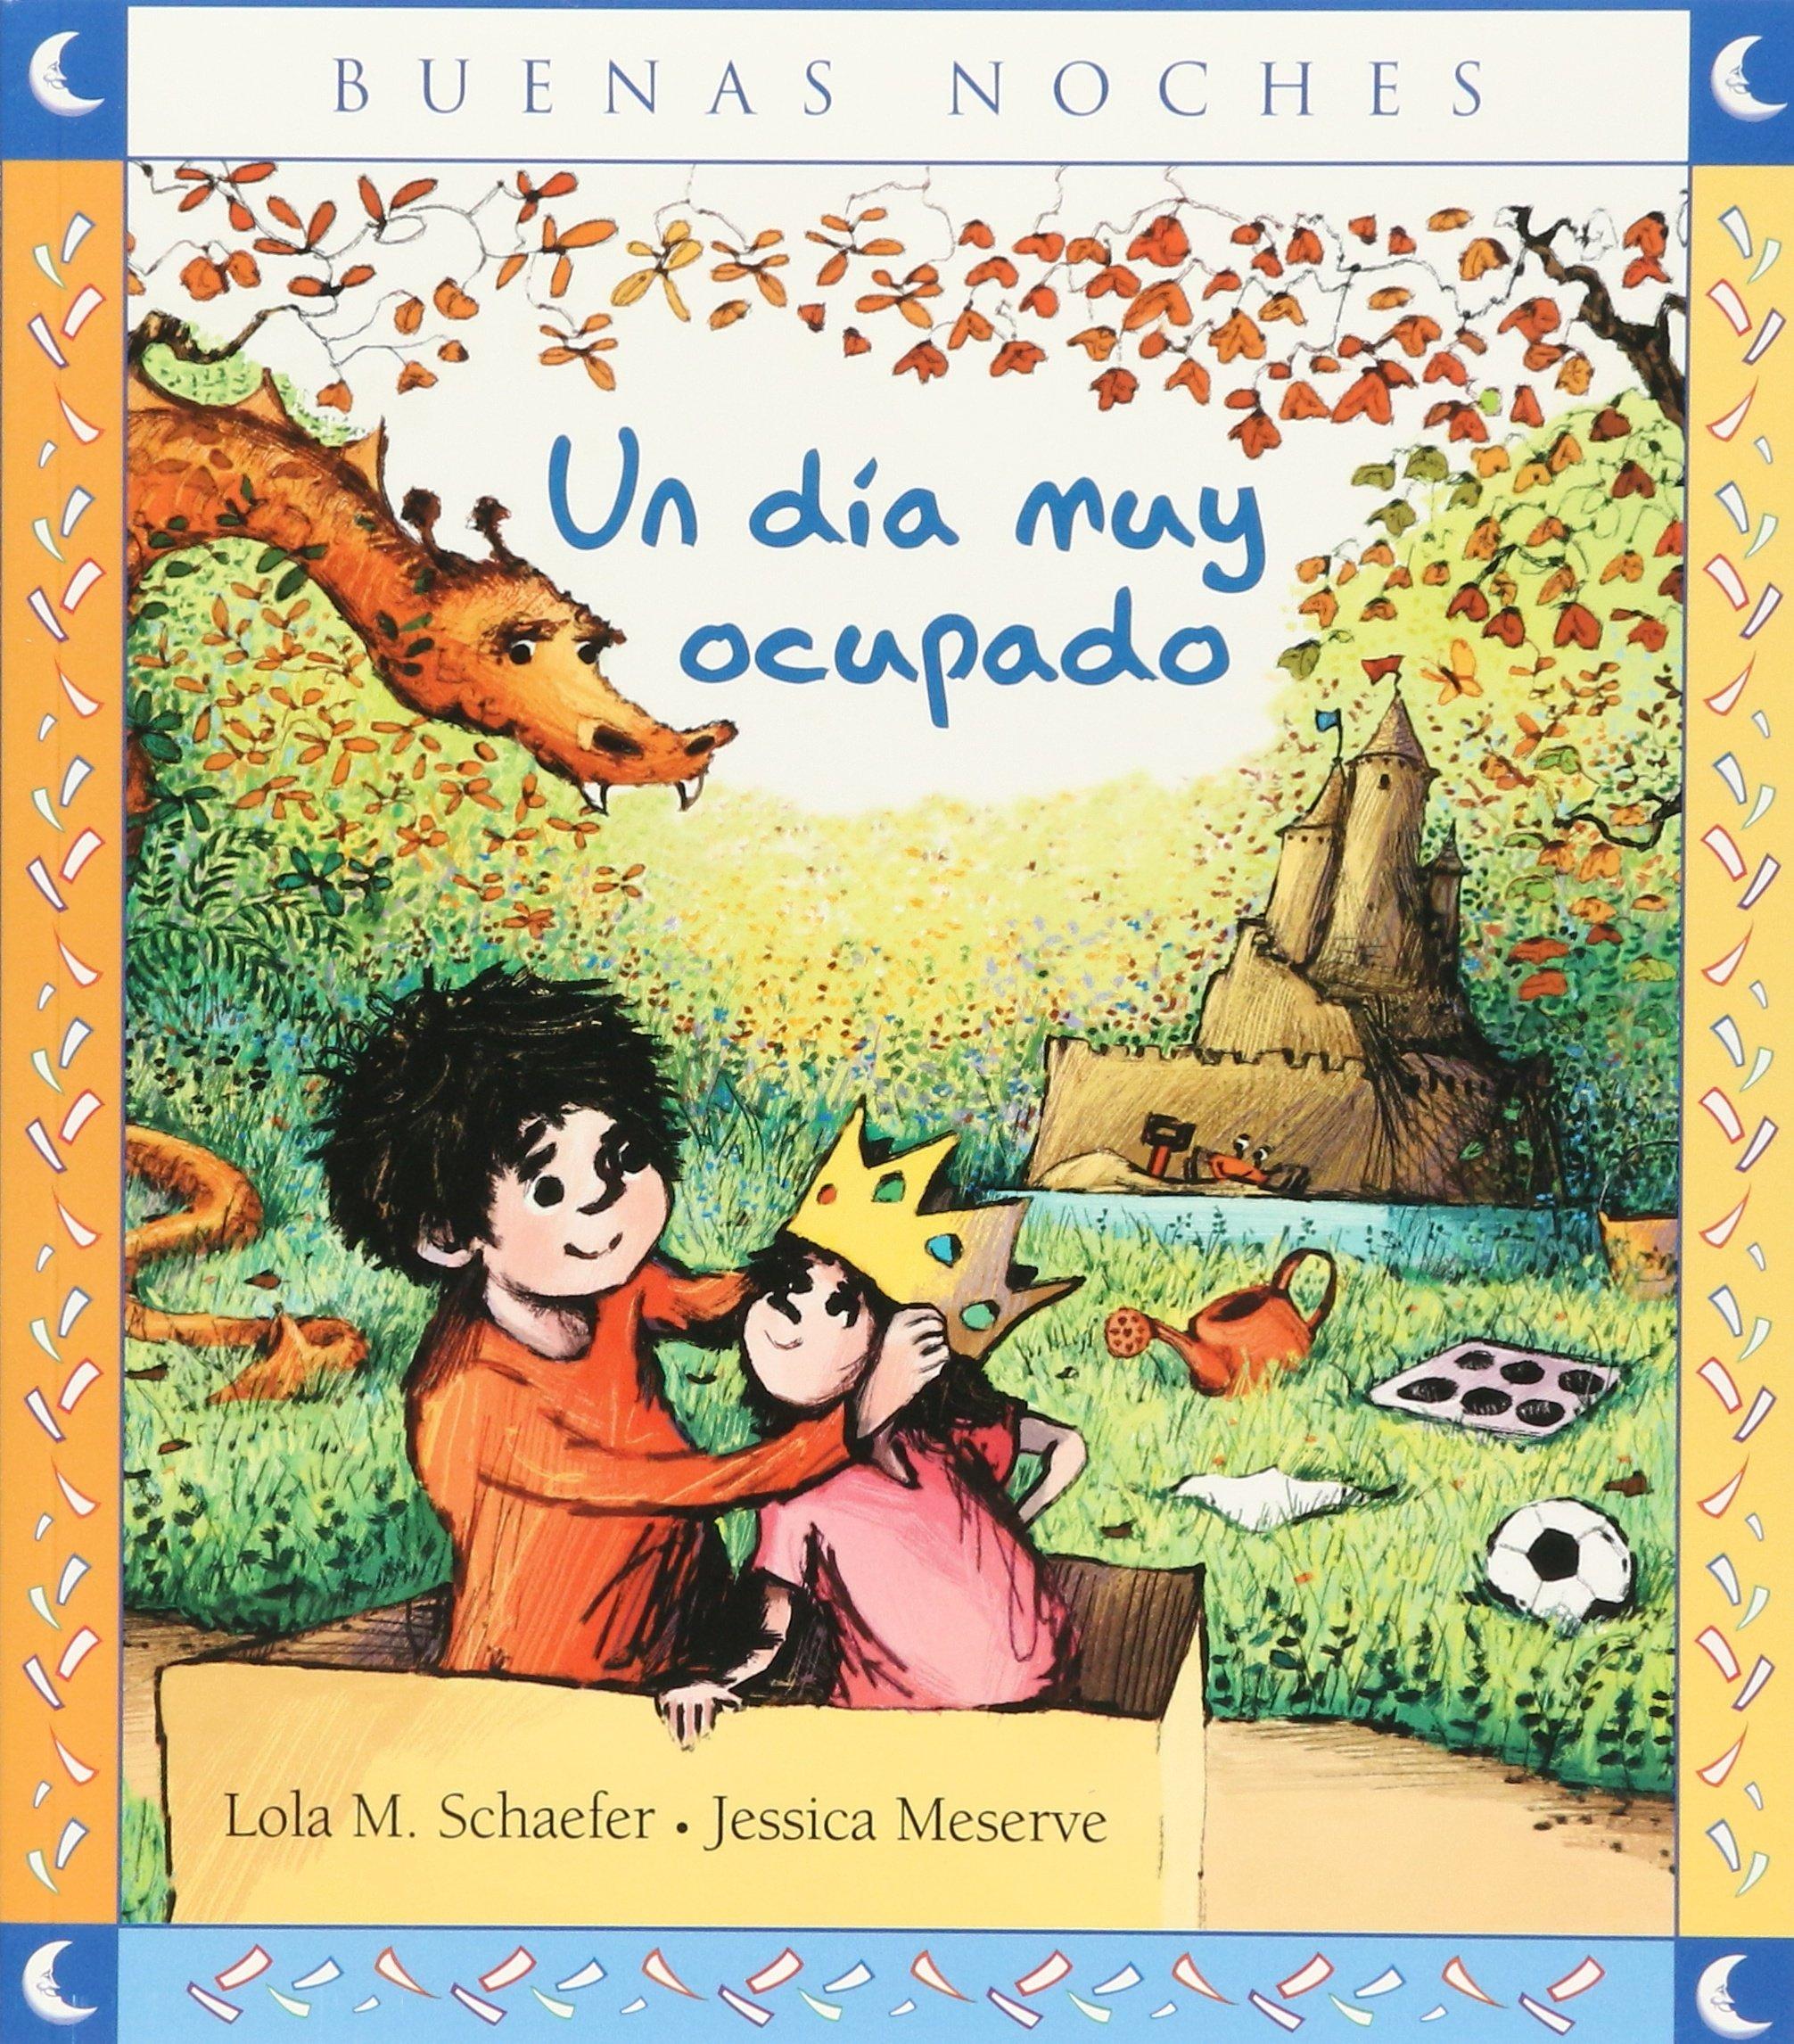 UN DIA MUY OCUPADO: LOLA SCHAEFER - JESSICA MESERVA: 9786071302502: Amazon.com: Books